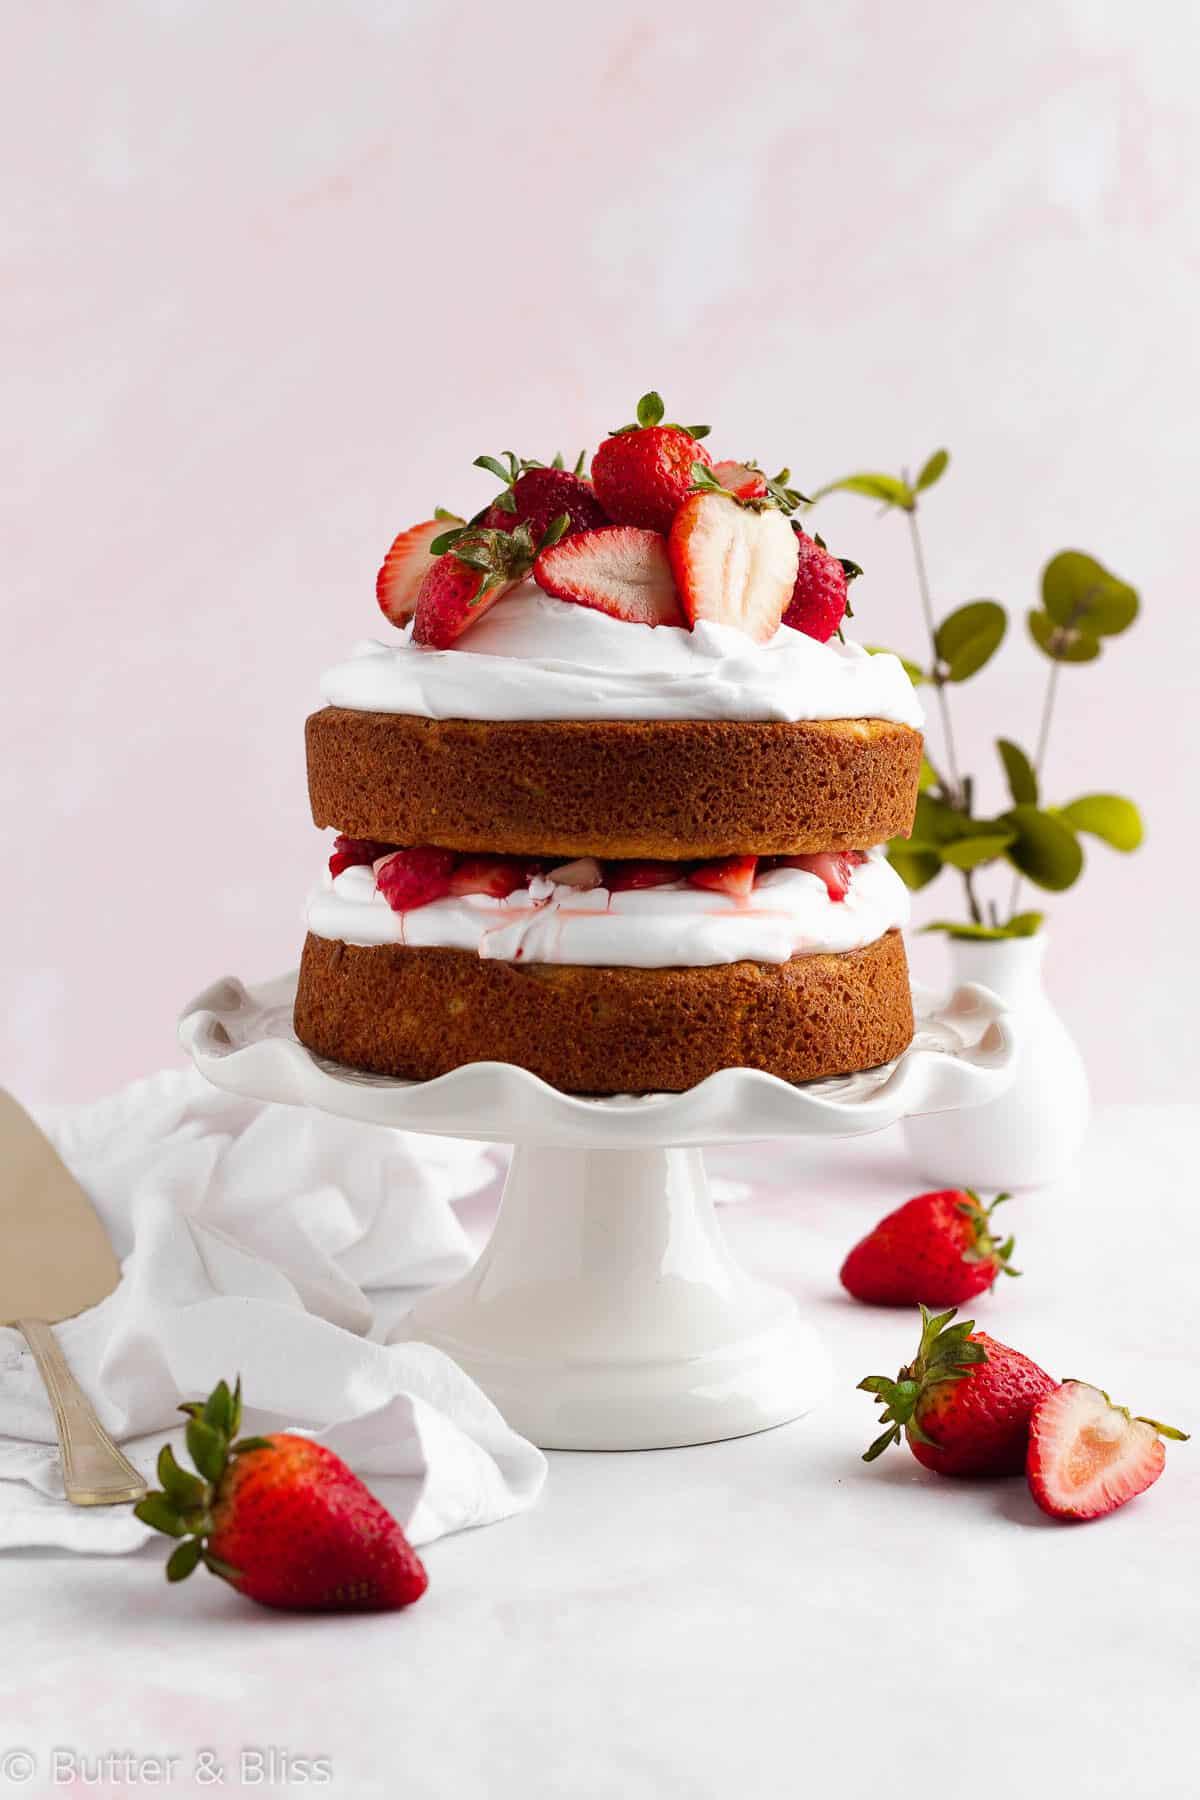 Strawberry shortcake layer cake on a cake platter